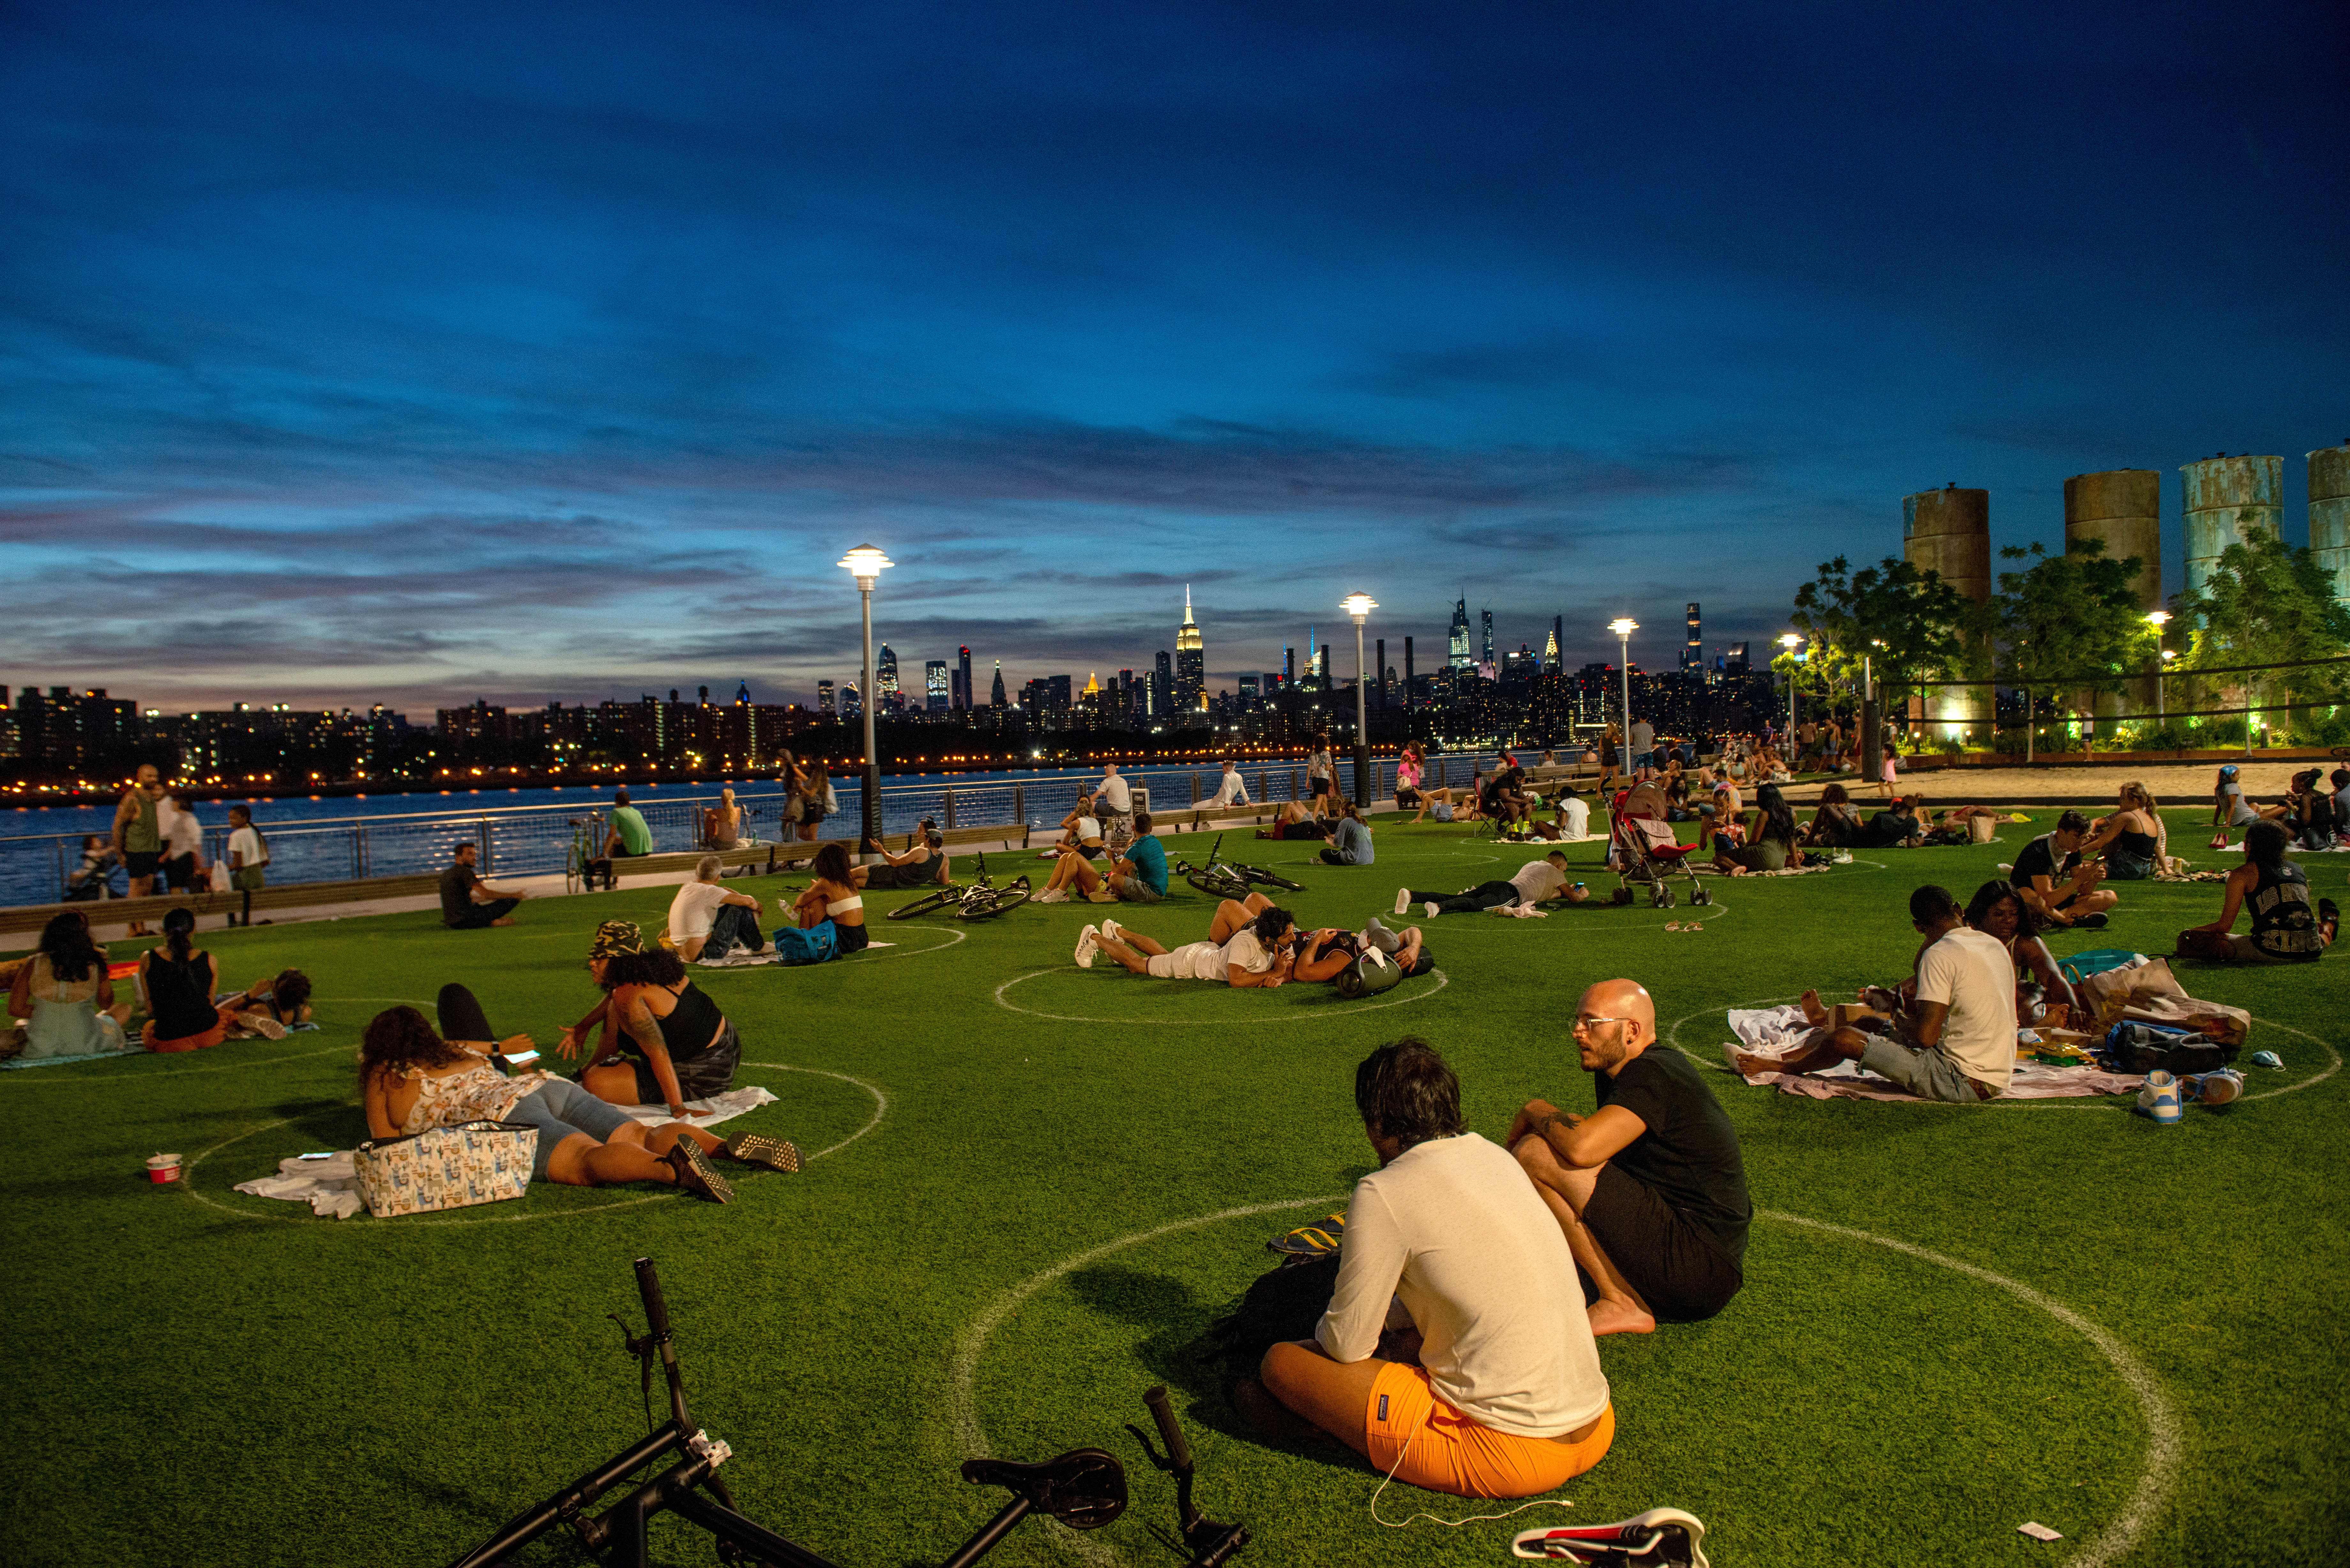 People visit Domino Park in Brookyln, New York, on July 26.